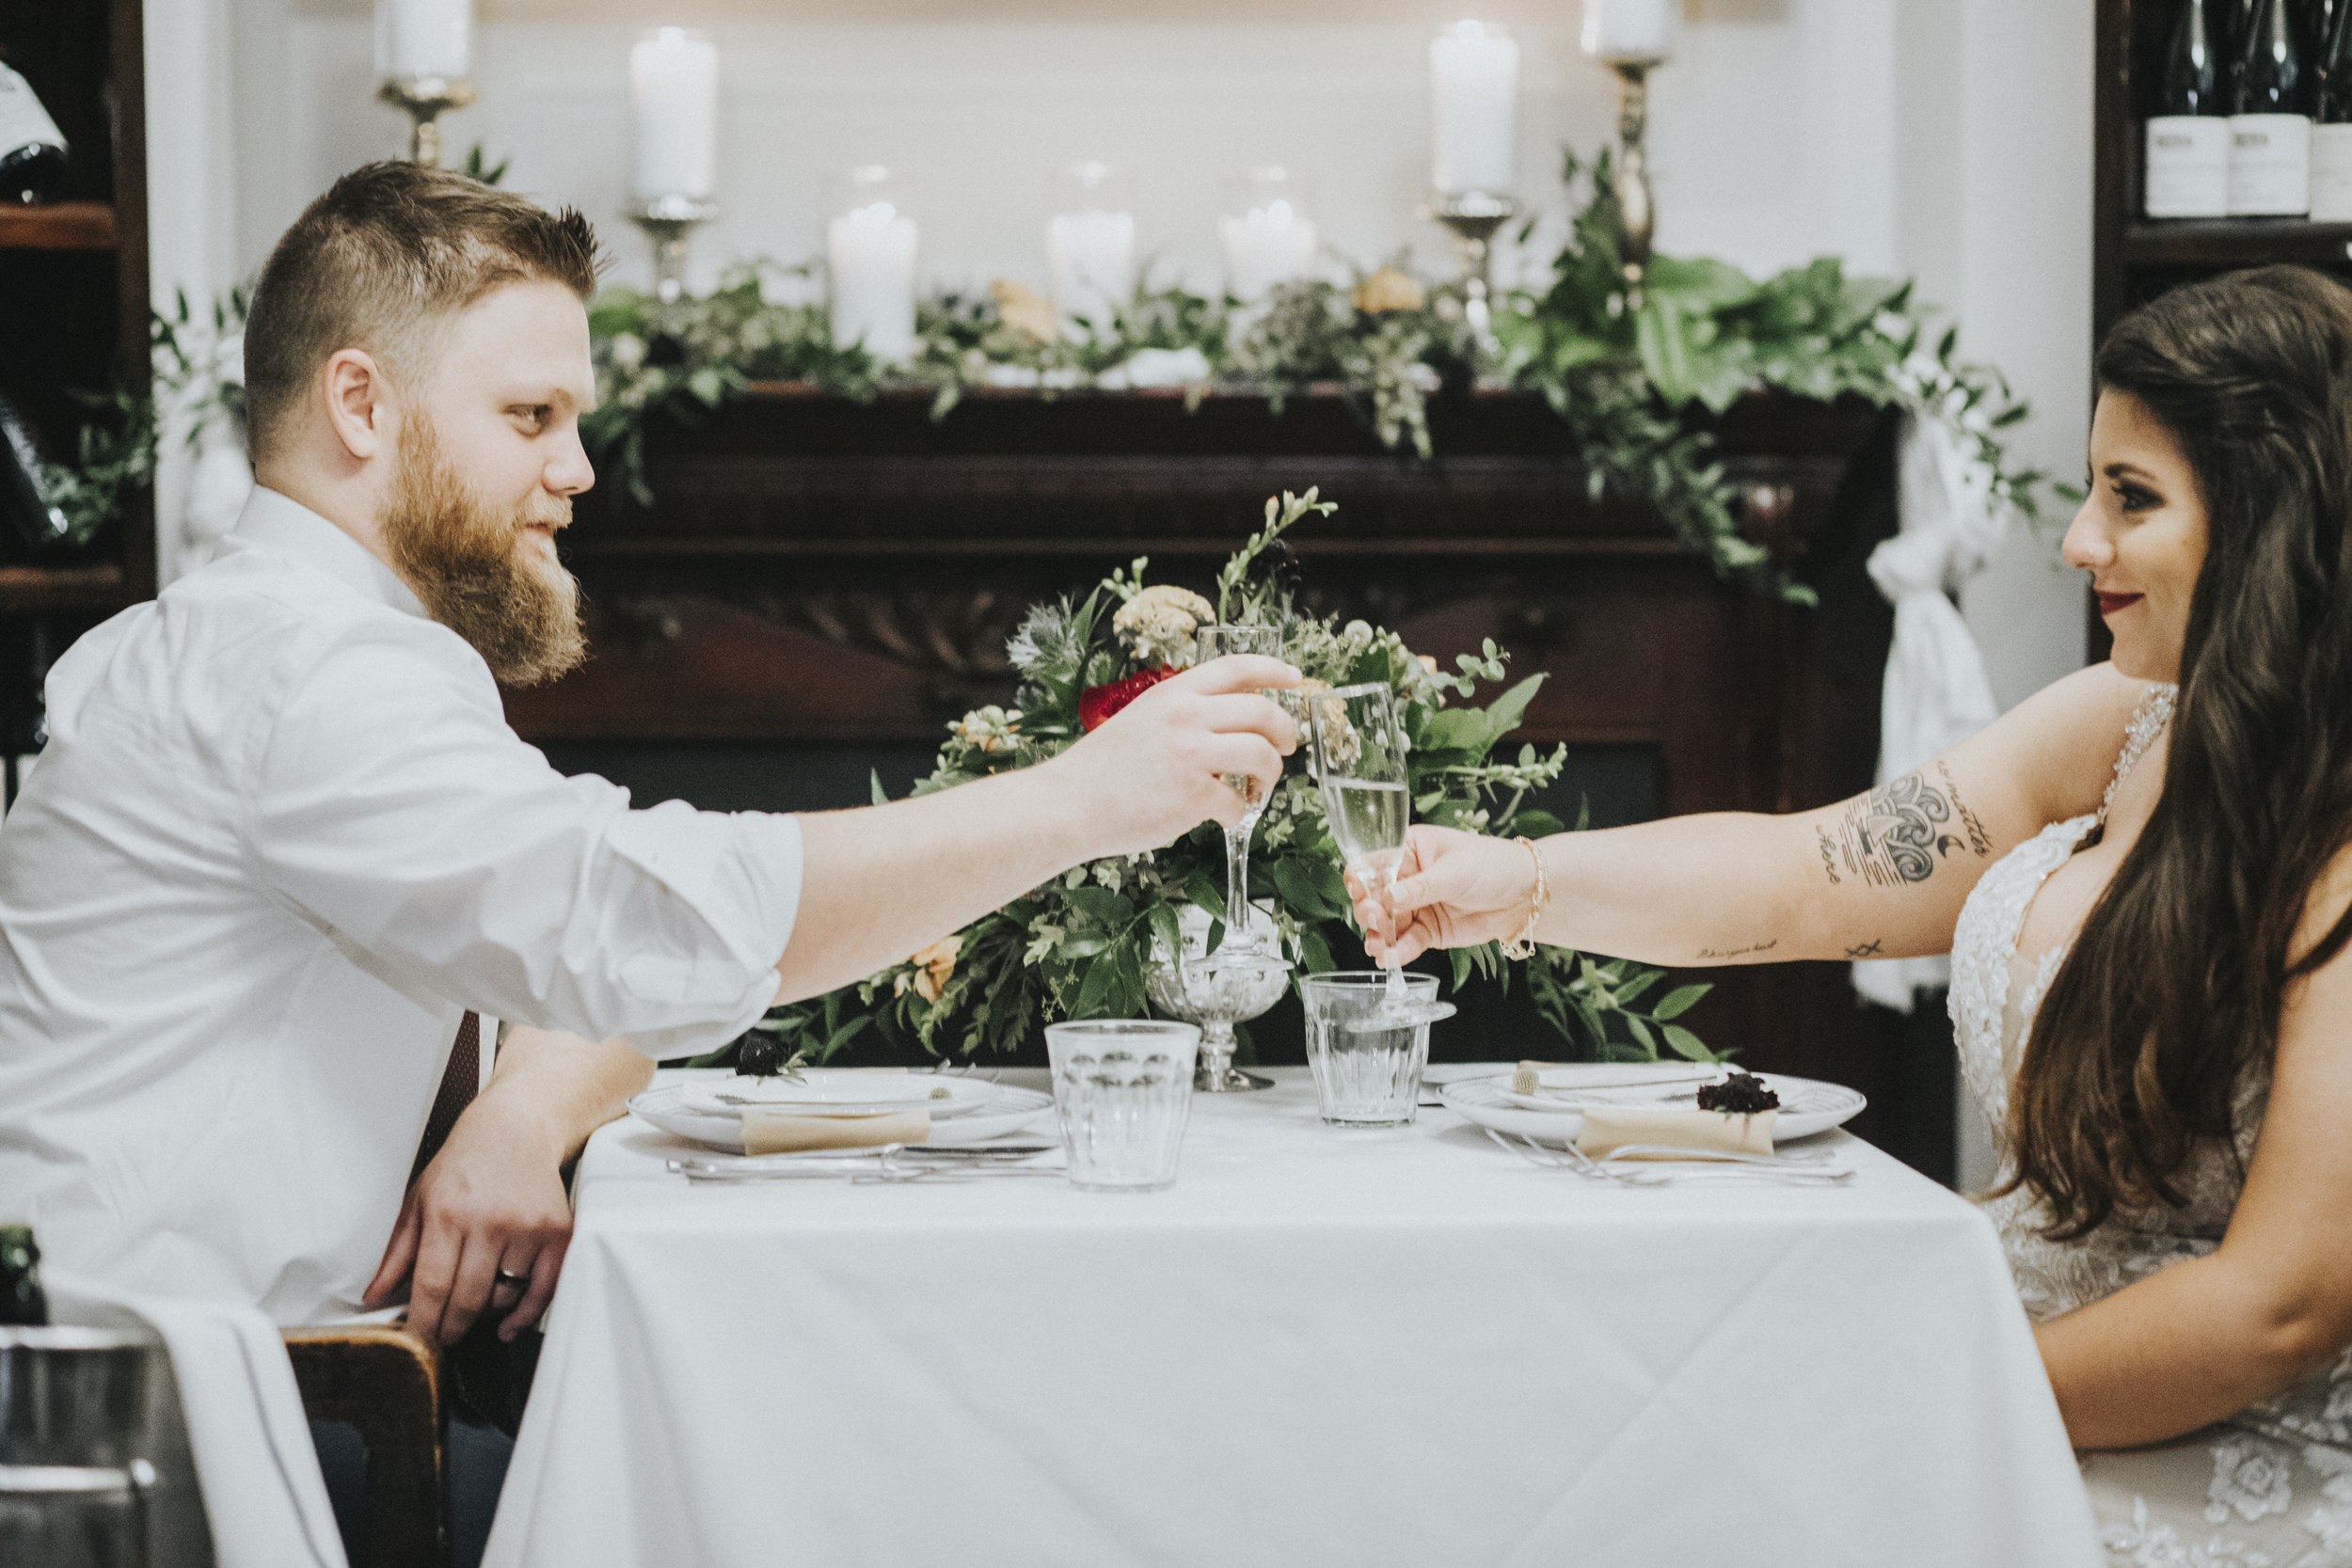 207 tiny-luxe-weddings-custom-elopement-summer-omaha-old-market.jpg